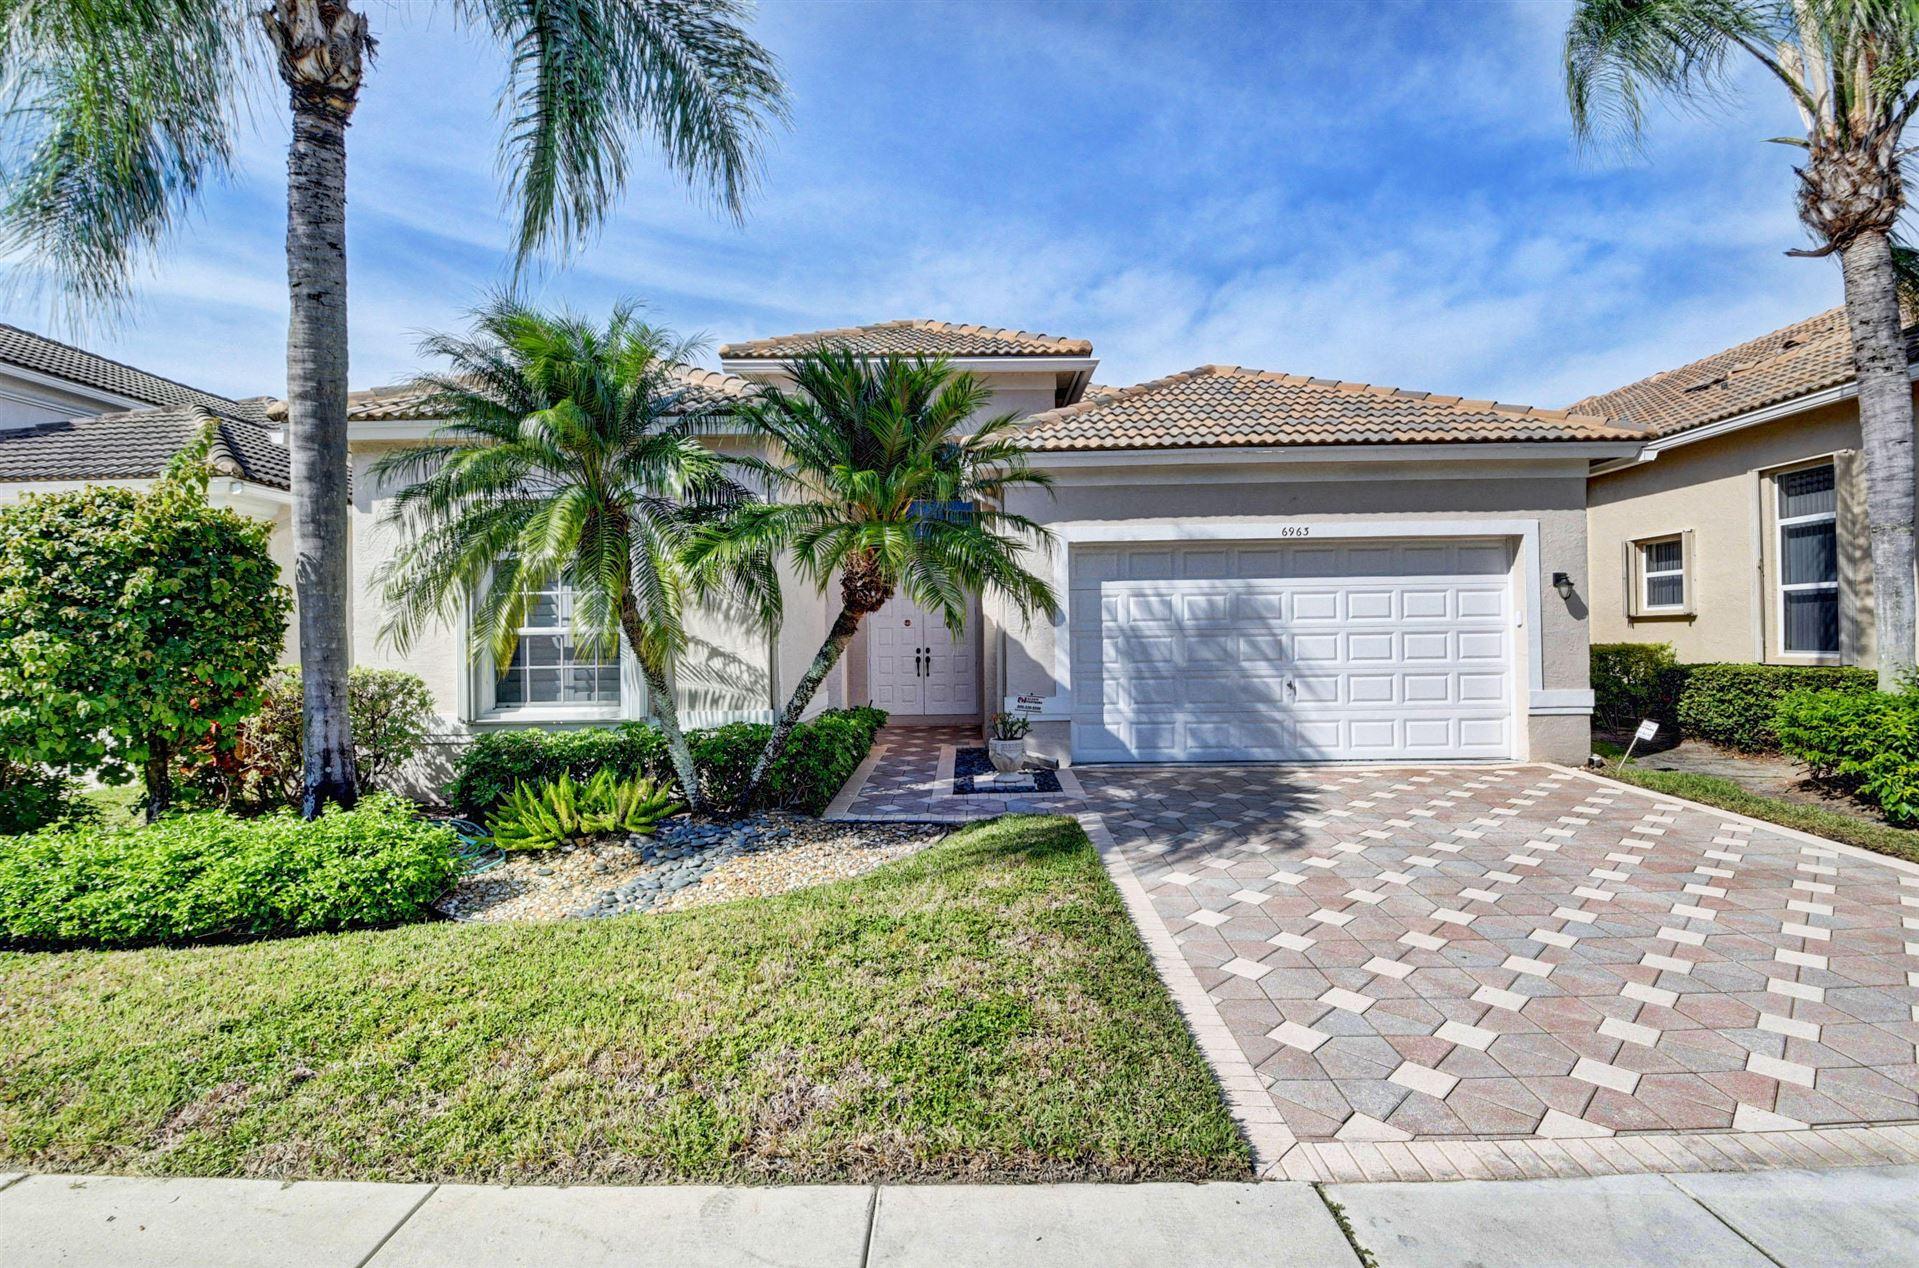 6963 Fairway Lakes Drive, Boynton Beach, FL 33472 - MLS#: RX-10716271